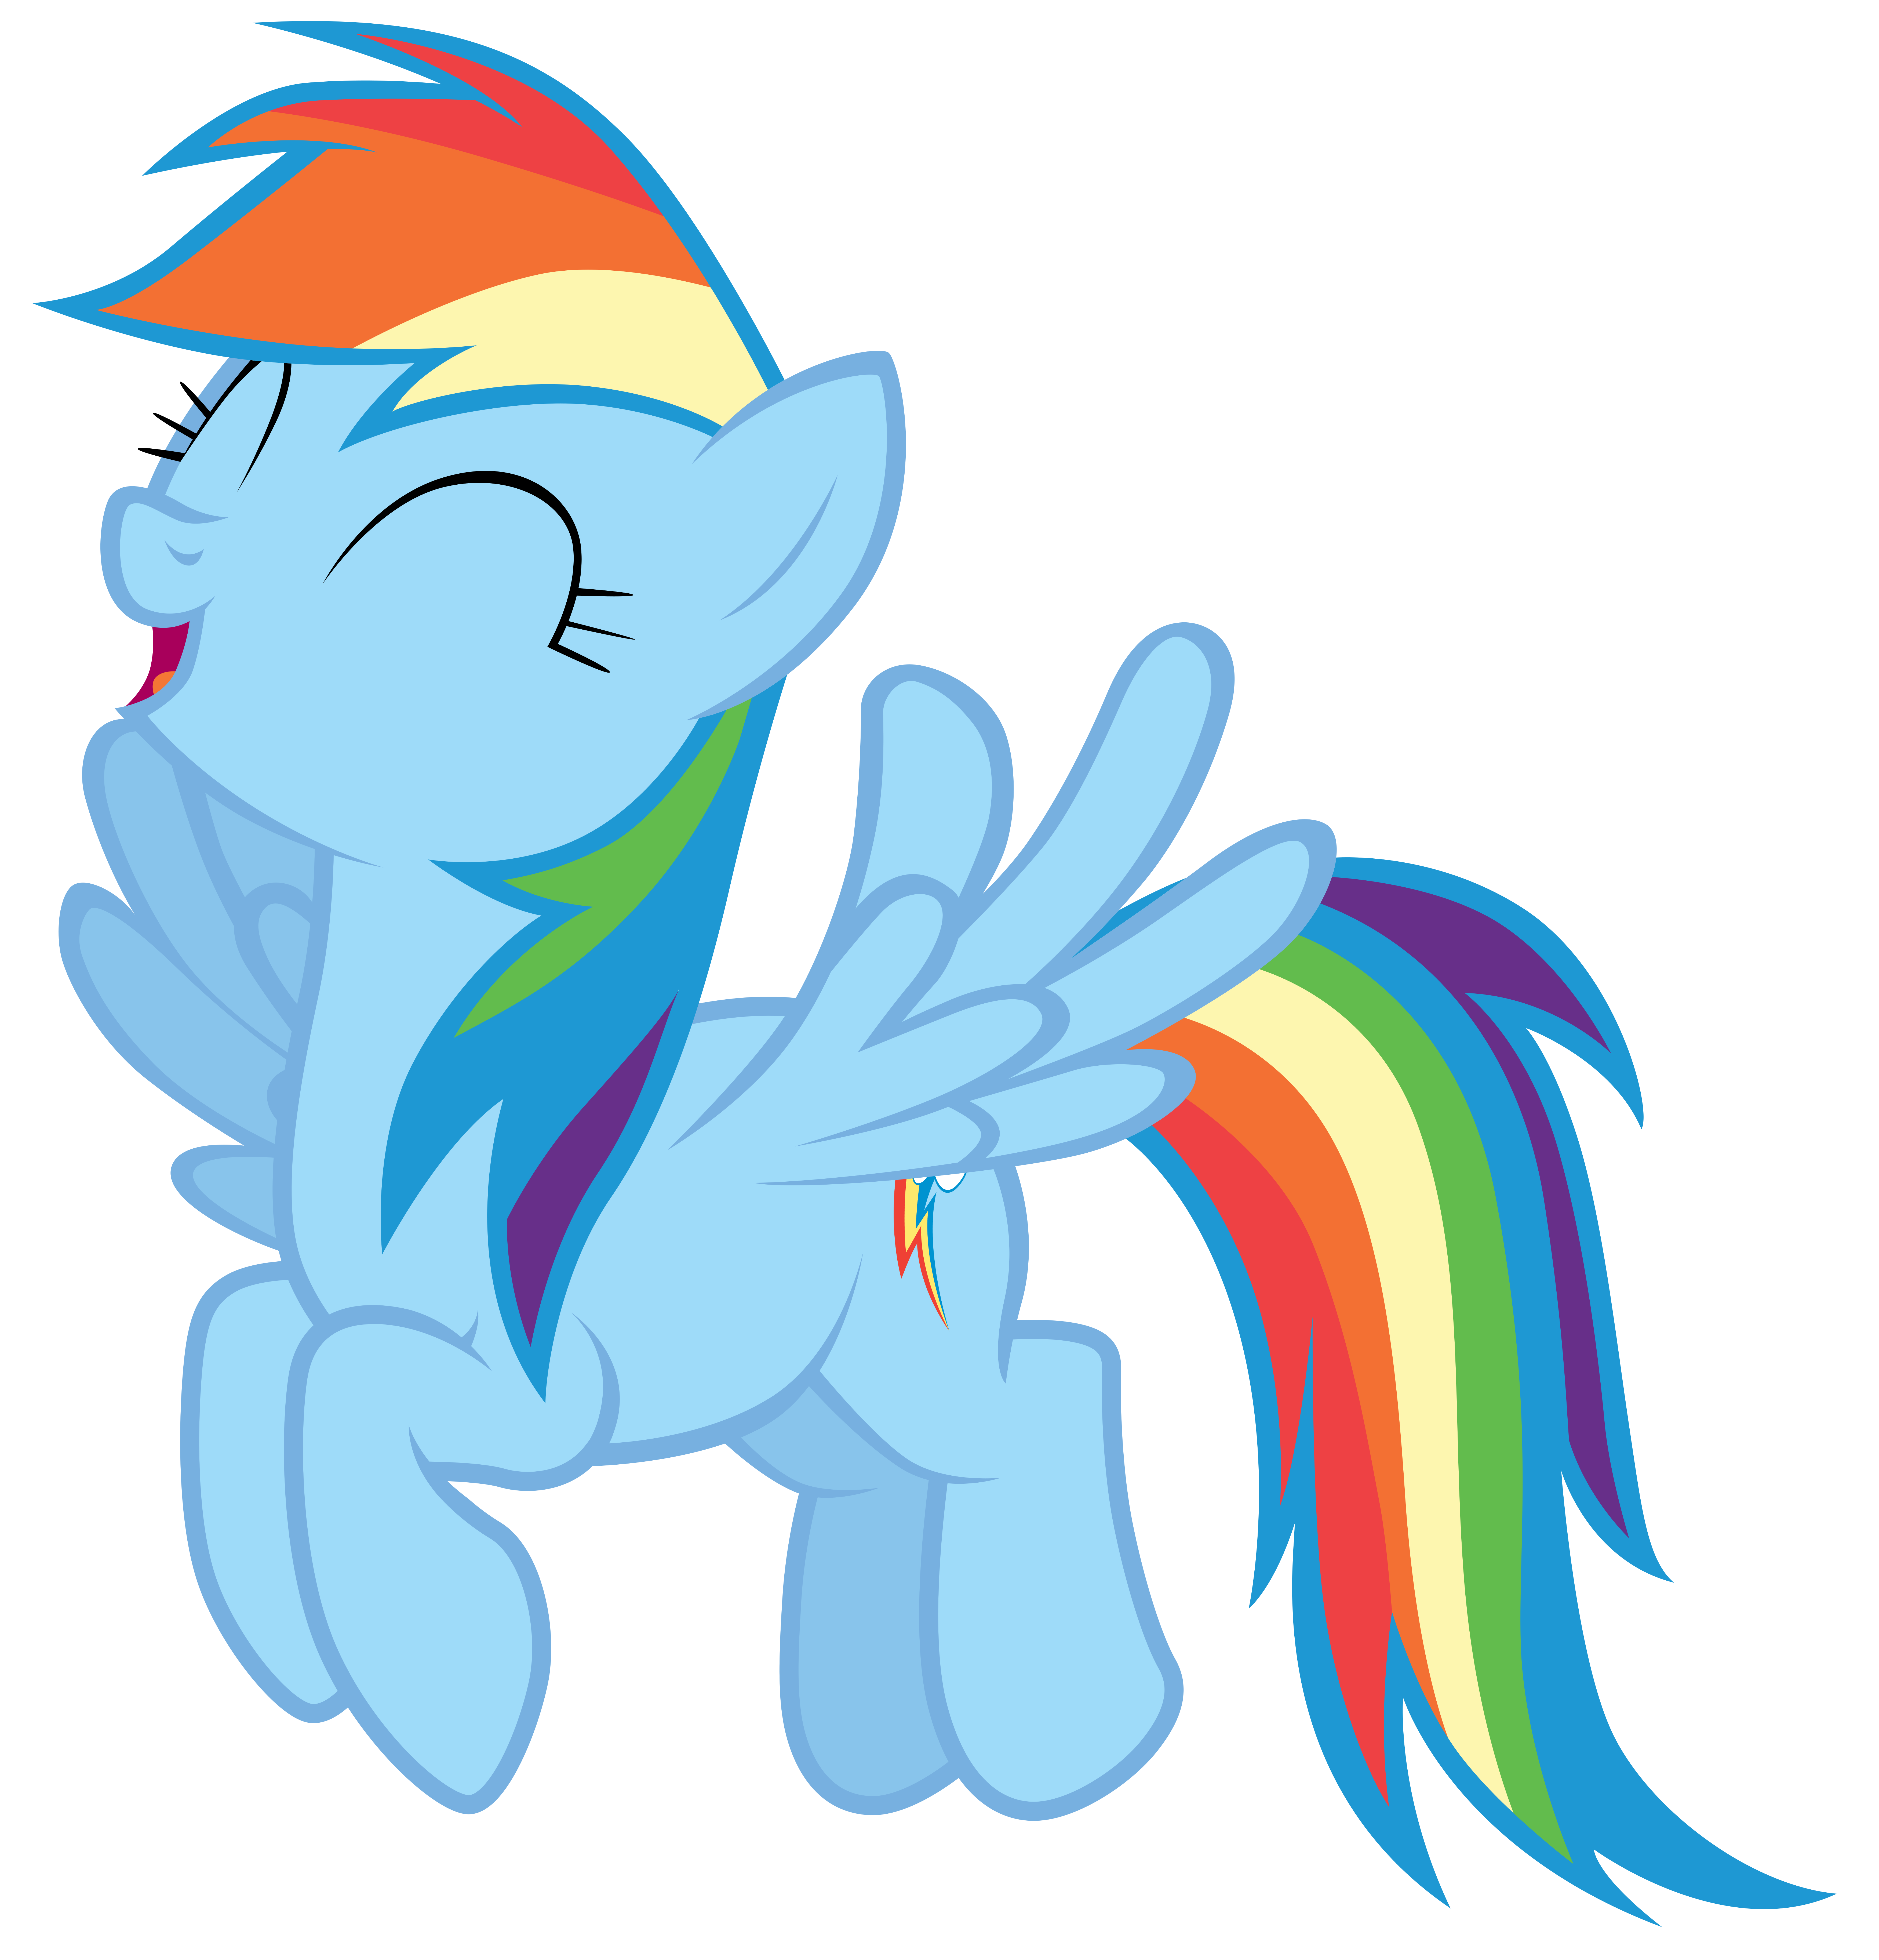 Rainbow Dash fluttering with excitement